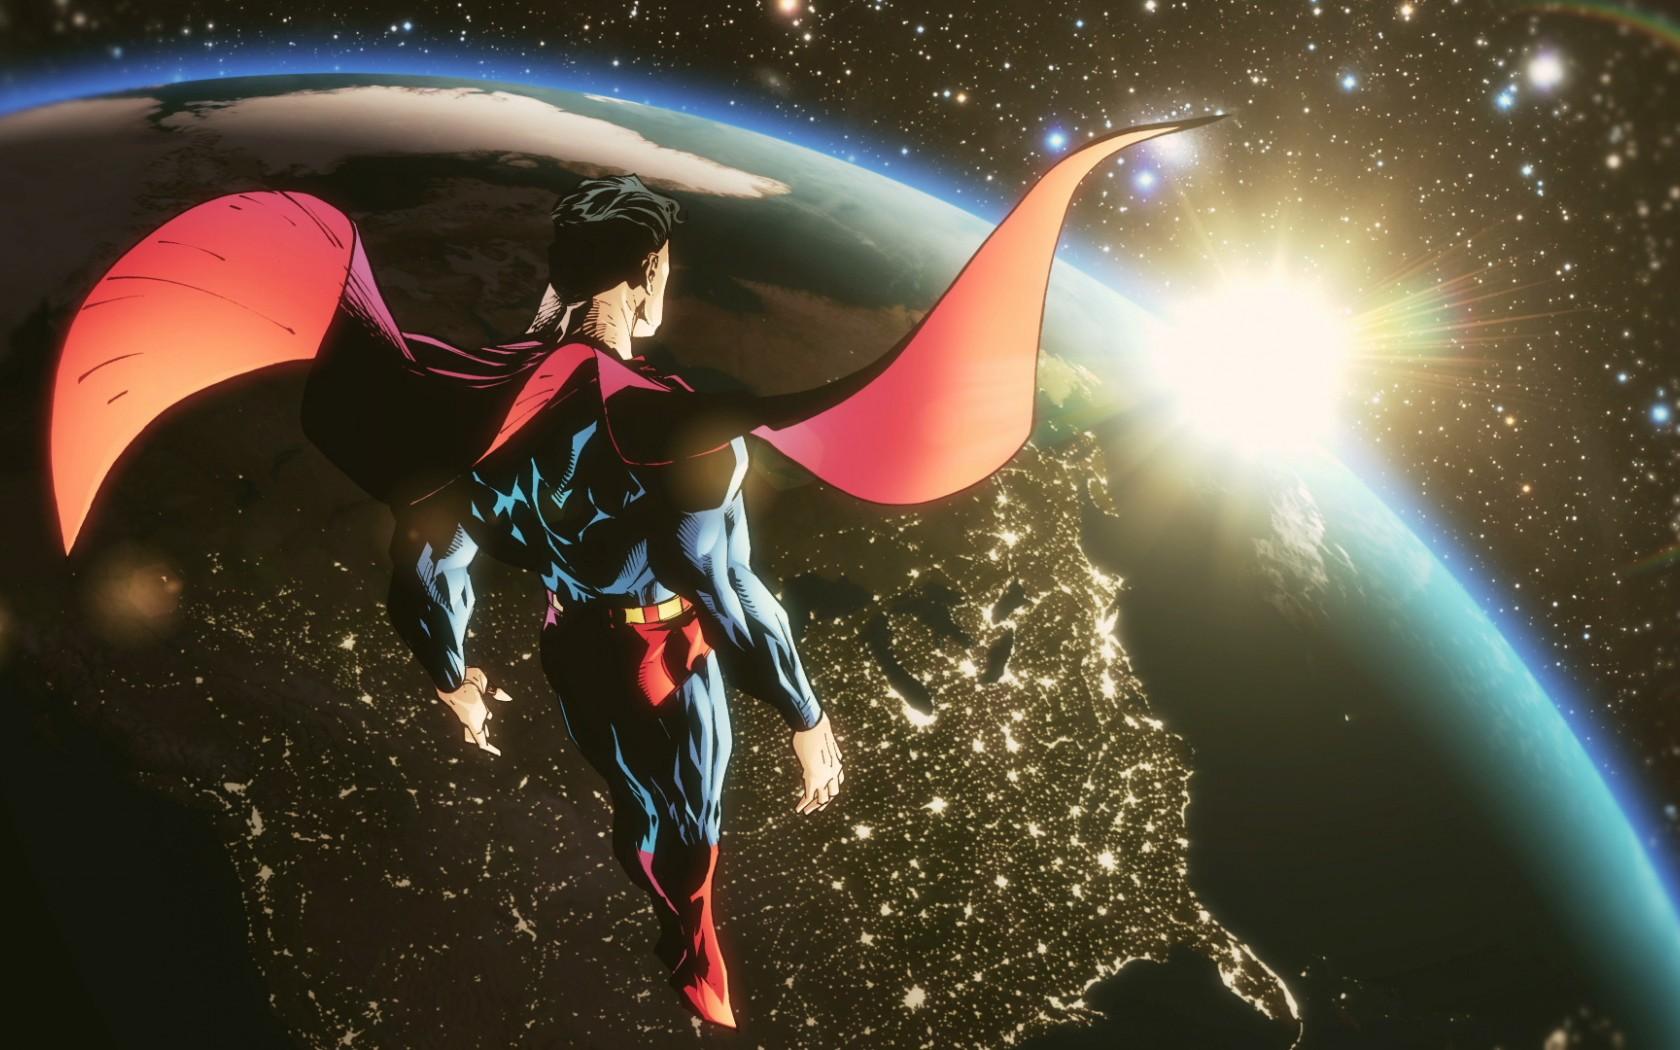 Superman in spaaaaace.jpg